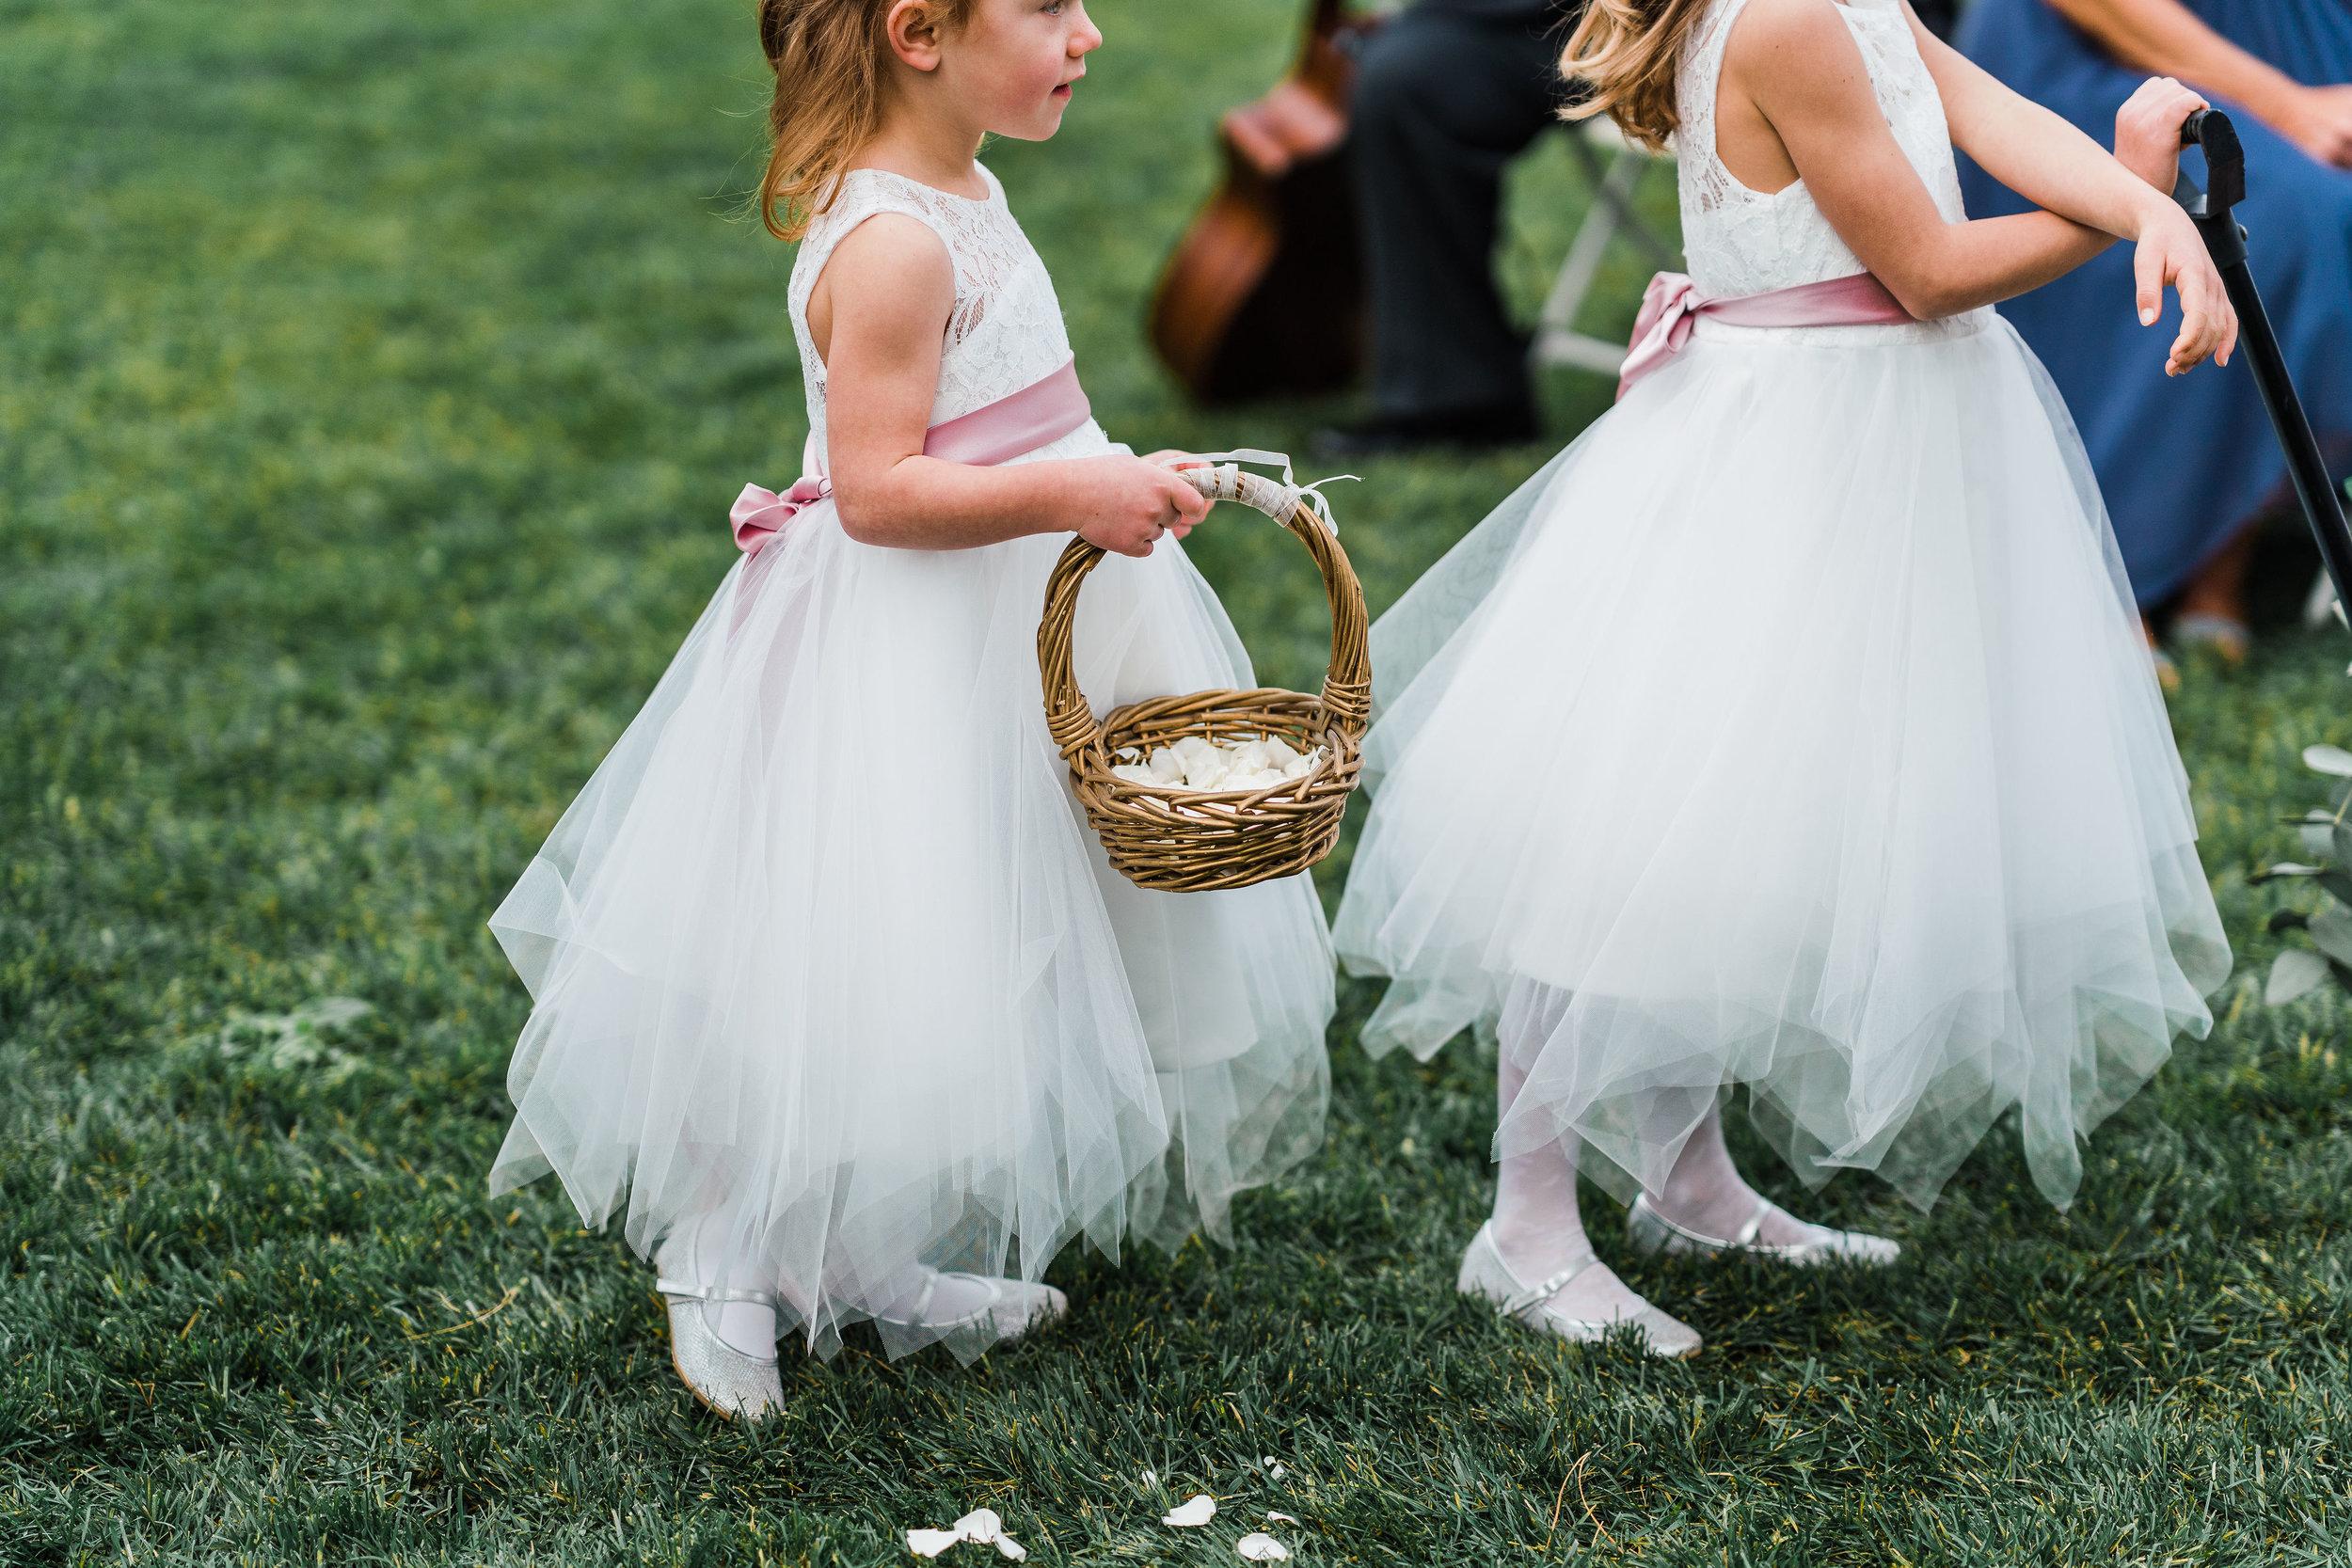 switzer-farm-wedding-westport-brandon-bibbins-photograhy-fine-art-054.jpg